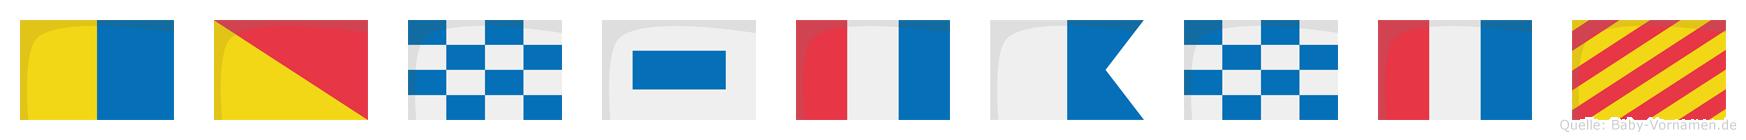 Konstanty im Flaggenalphabet